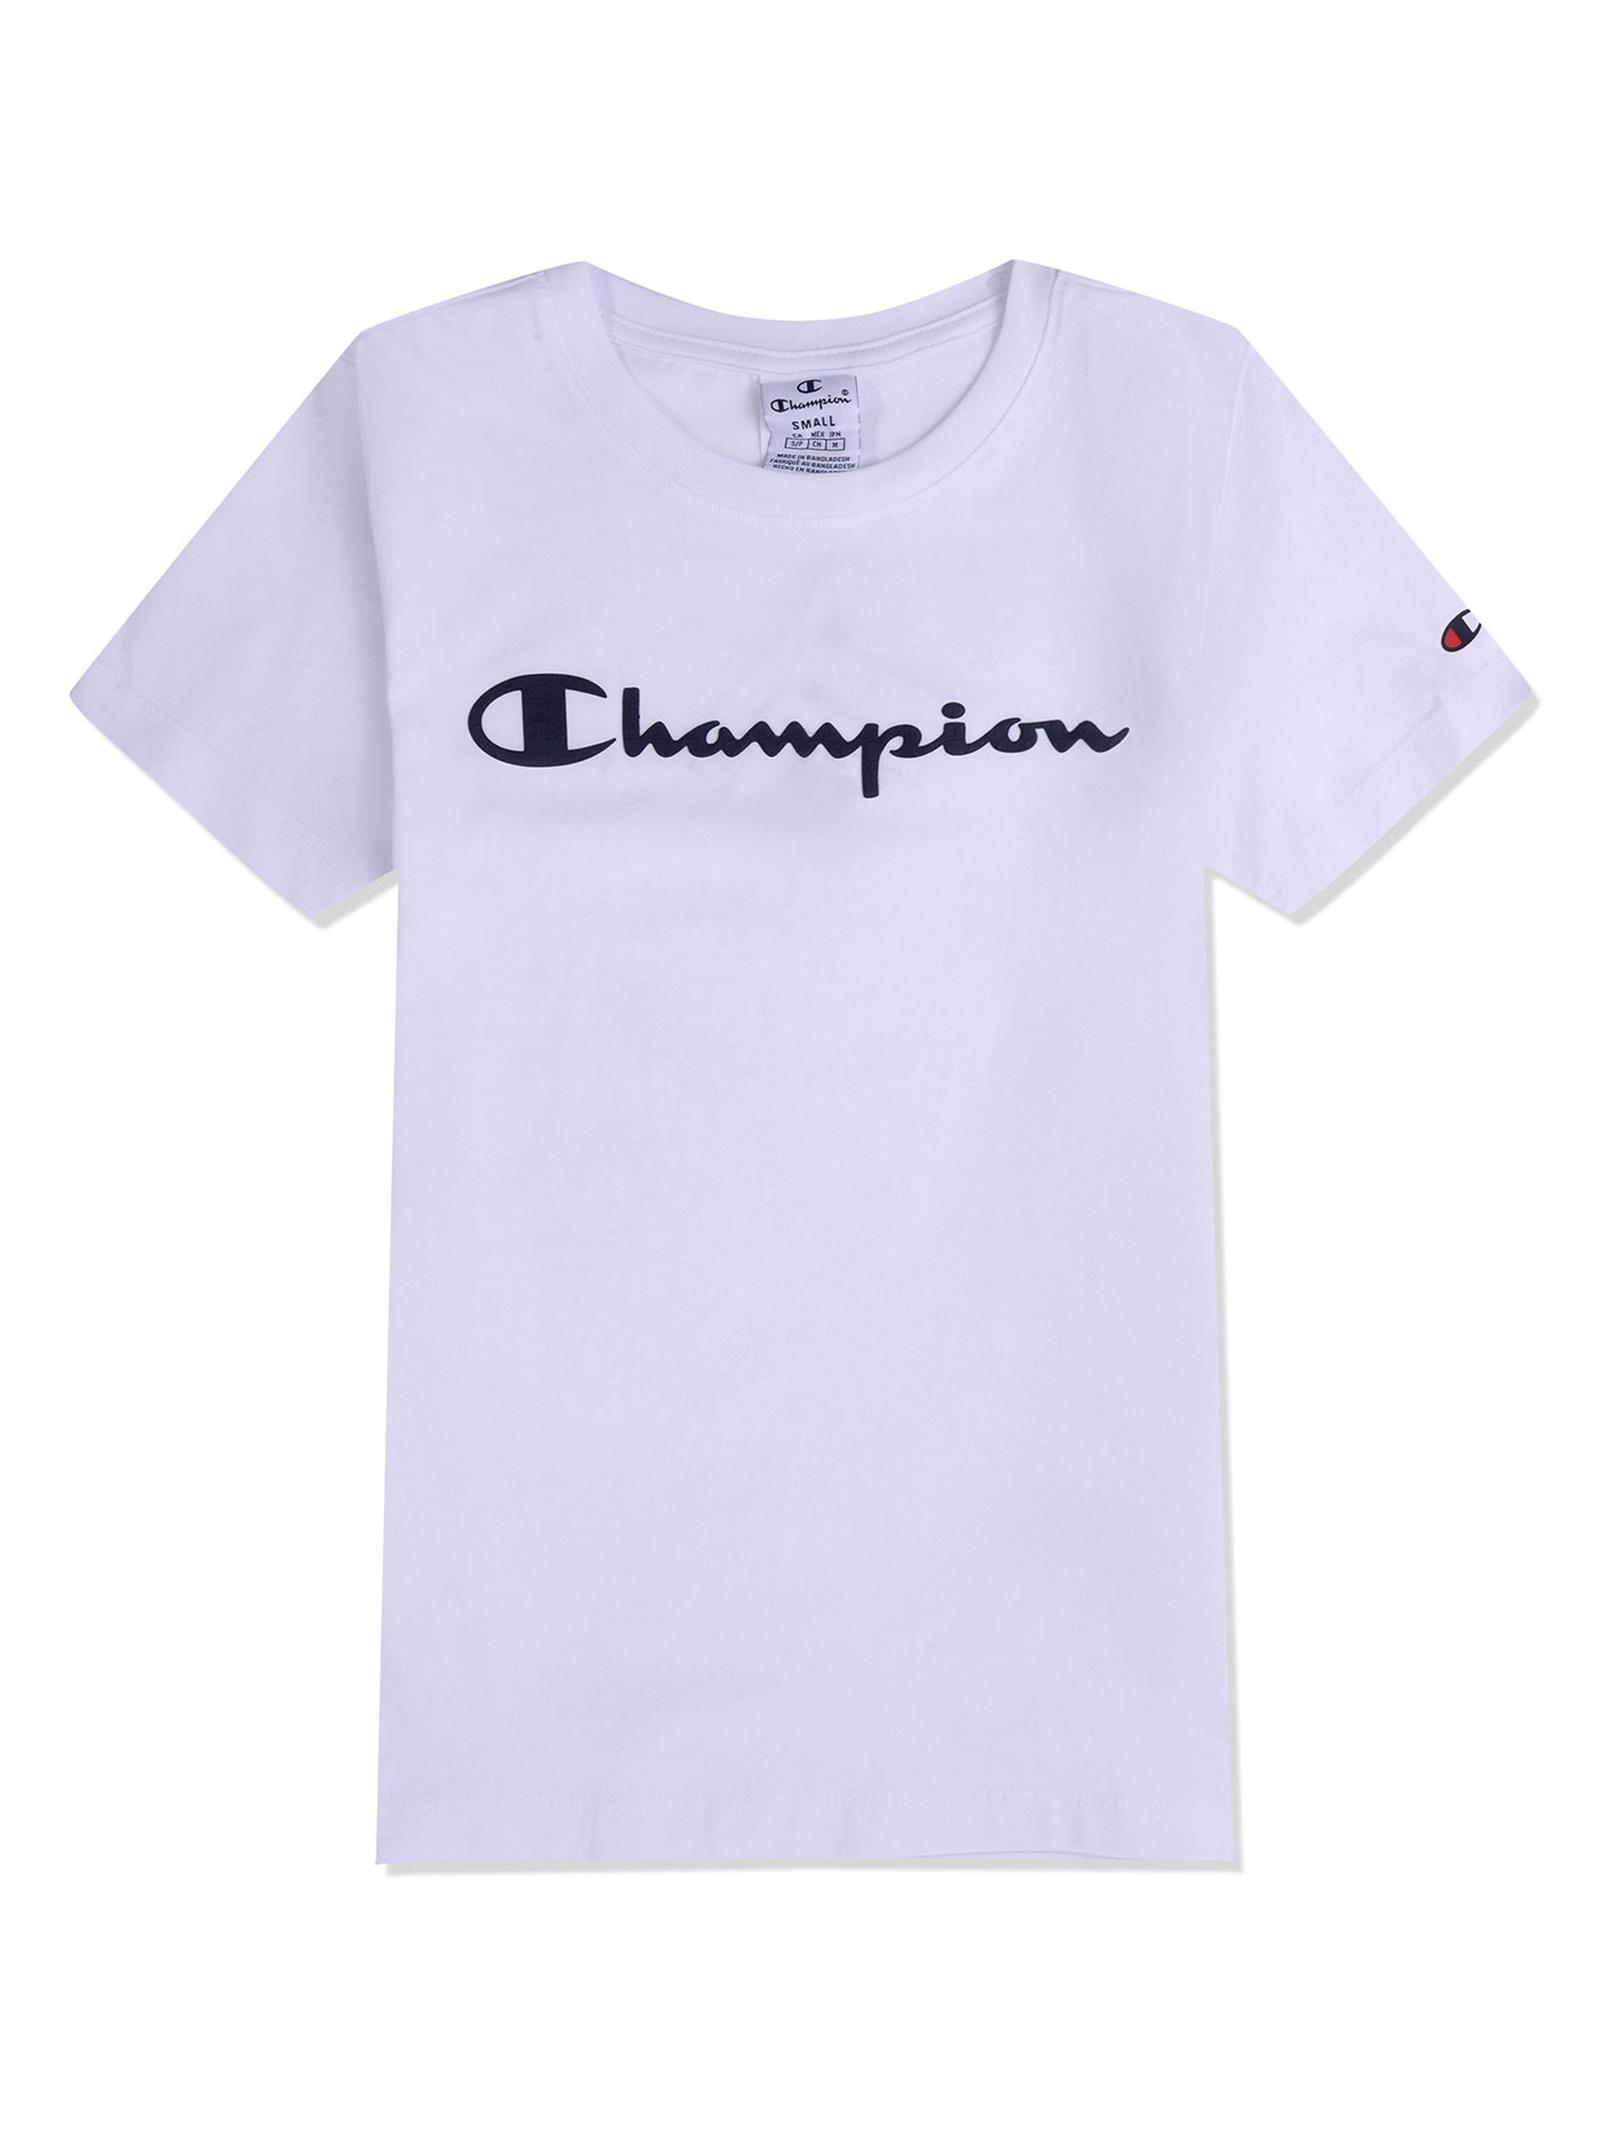 CHAMPIO CREWNWCK T-SHIRT CHAMPION | T-SHIRT | 112602WHT